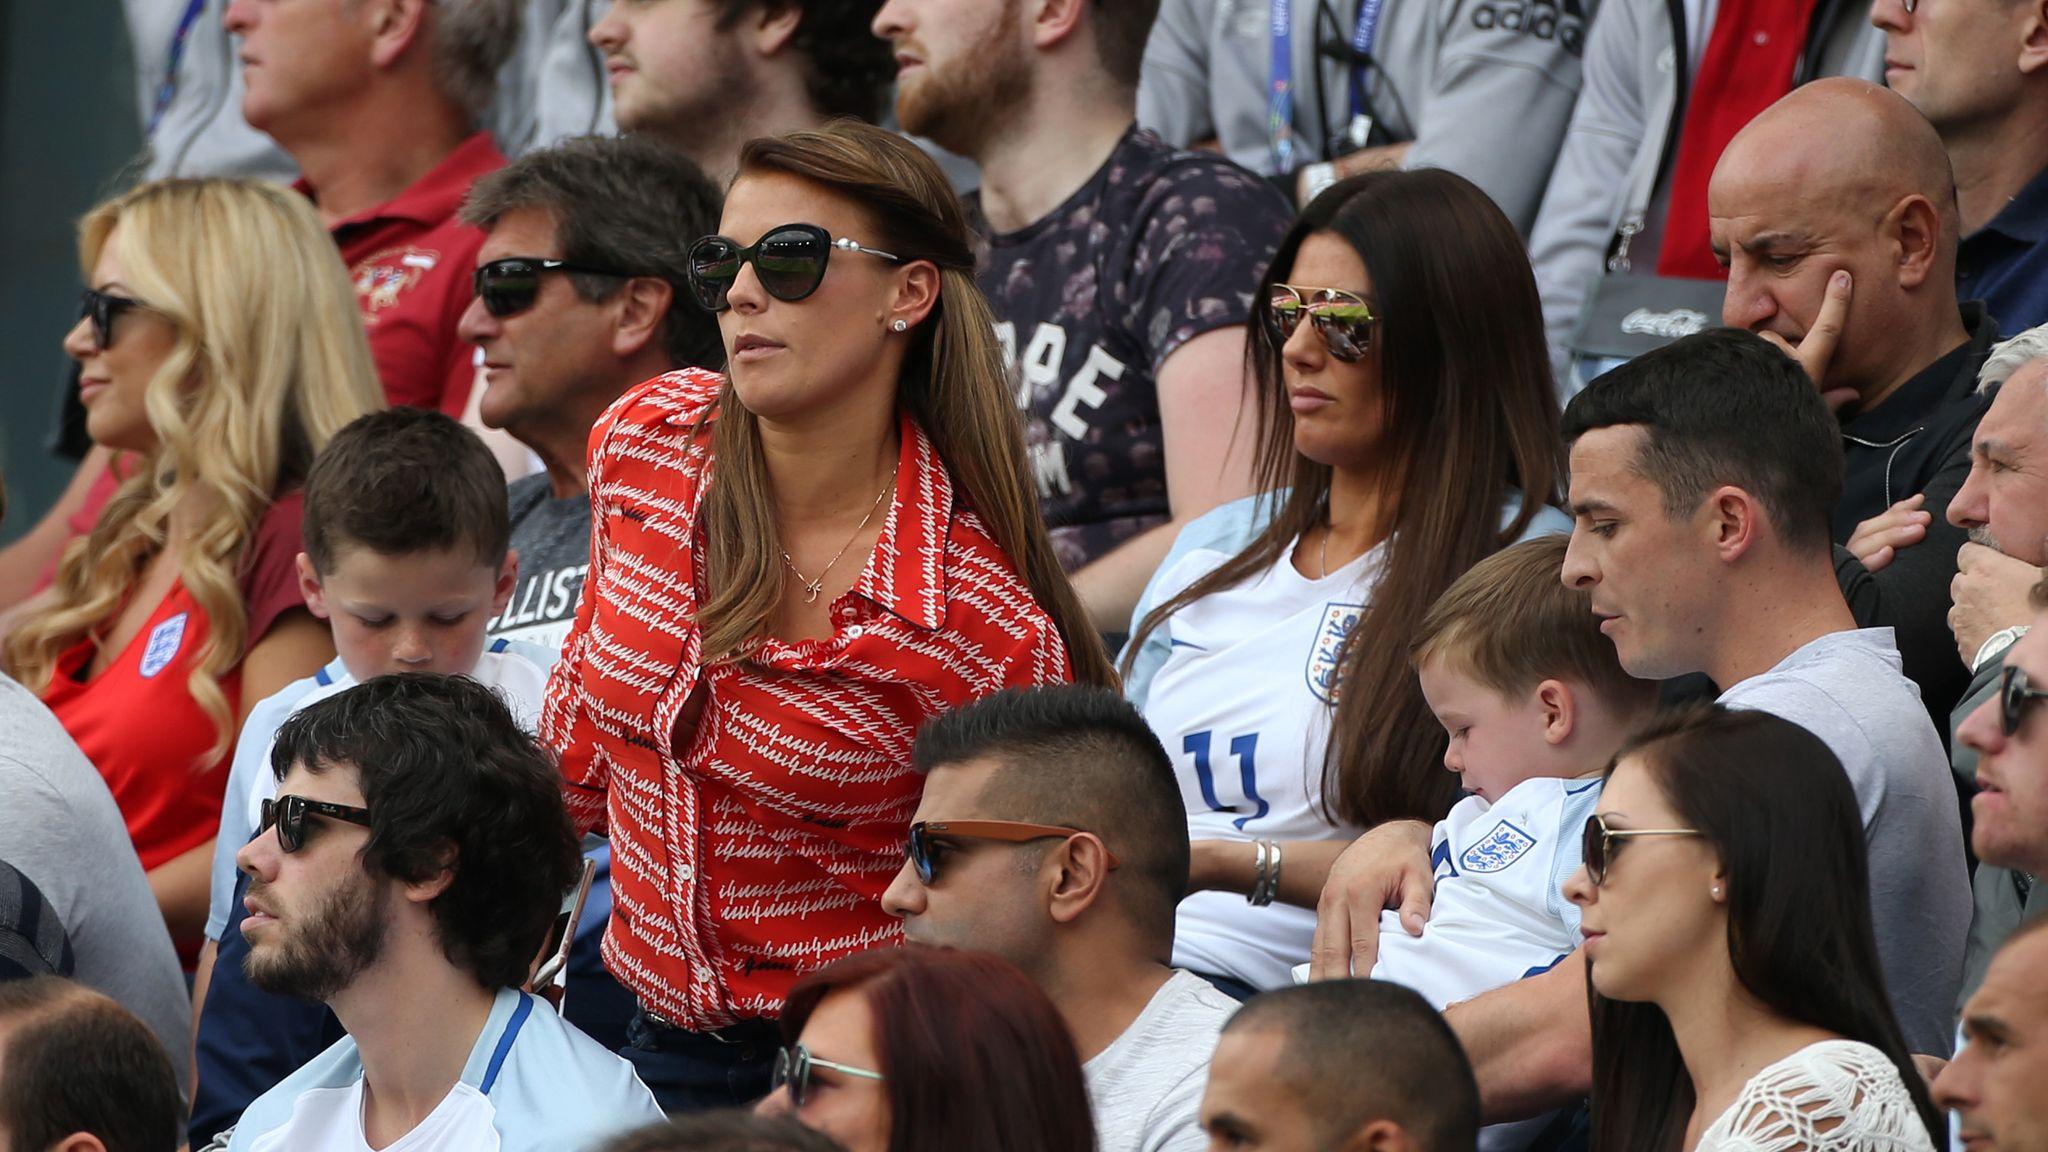 Roma block Rebekah Vardy on Twitter as social media reacts to Coleen Rooney spat